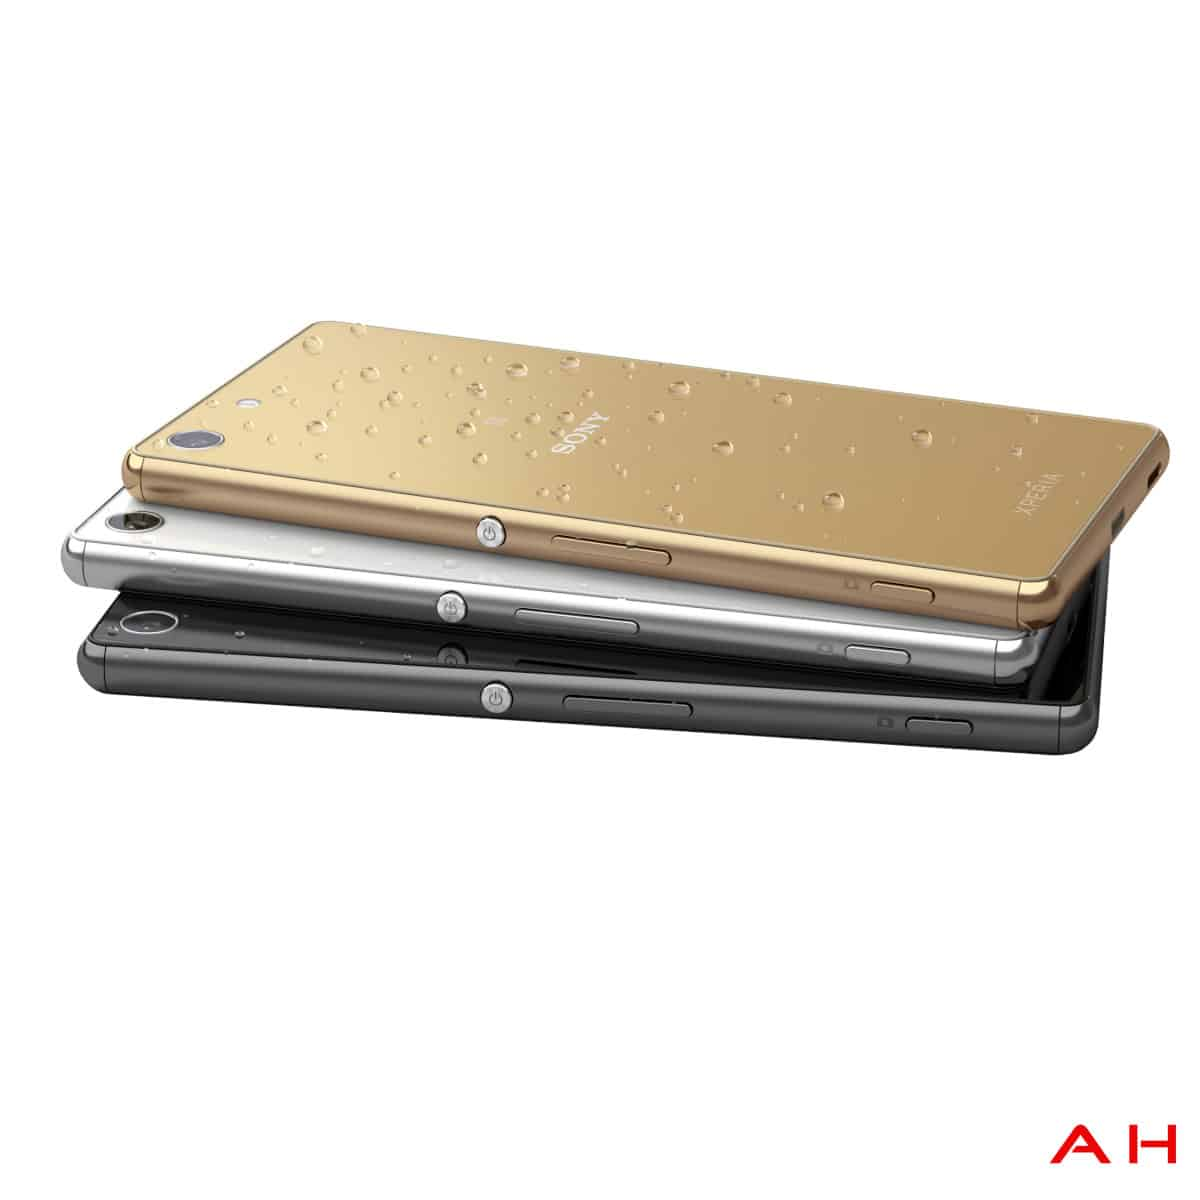 AH Sony Xperia M5 Press Images 1